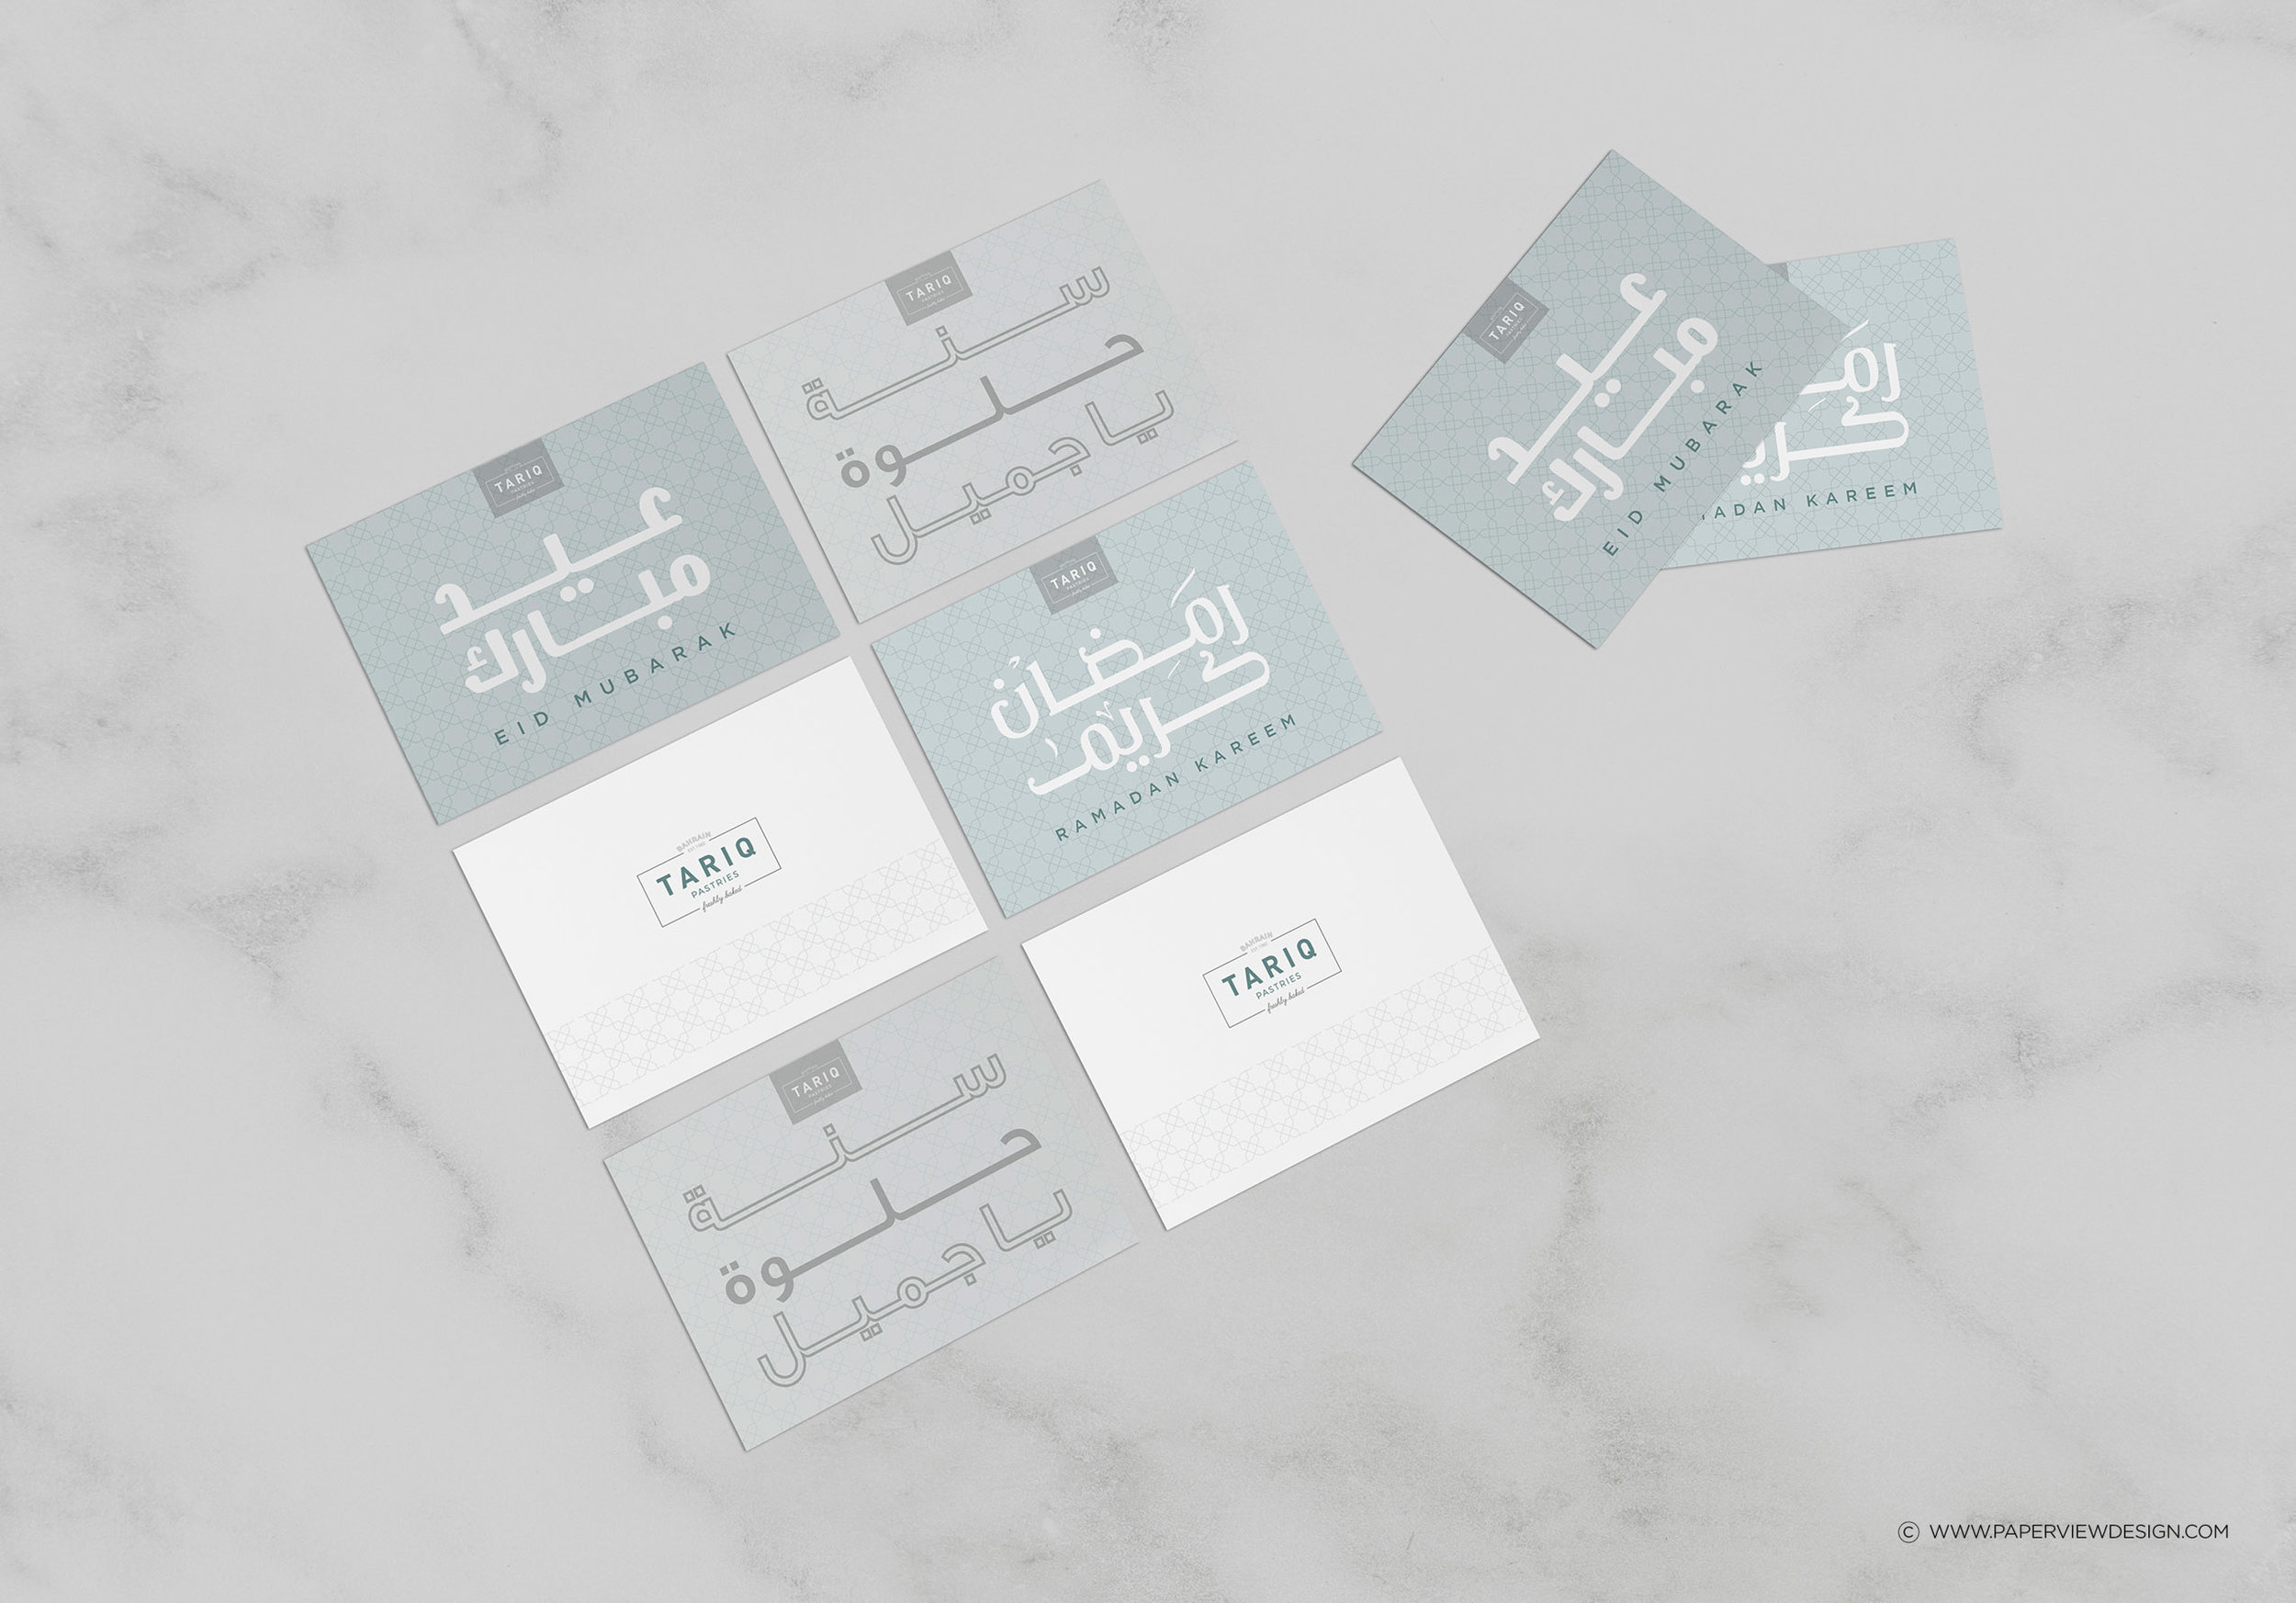 Tariq-Pastries-Cards-Branding-Bahrain